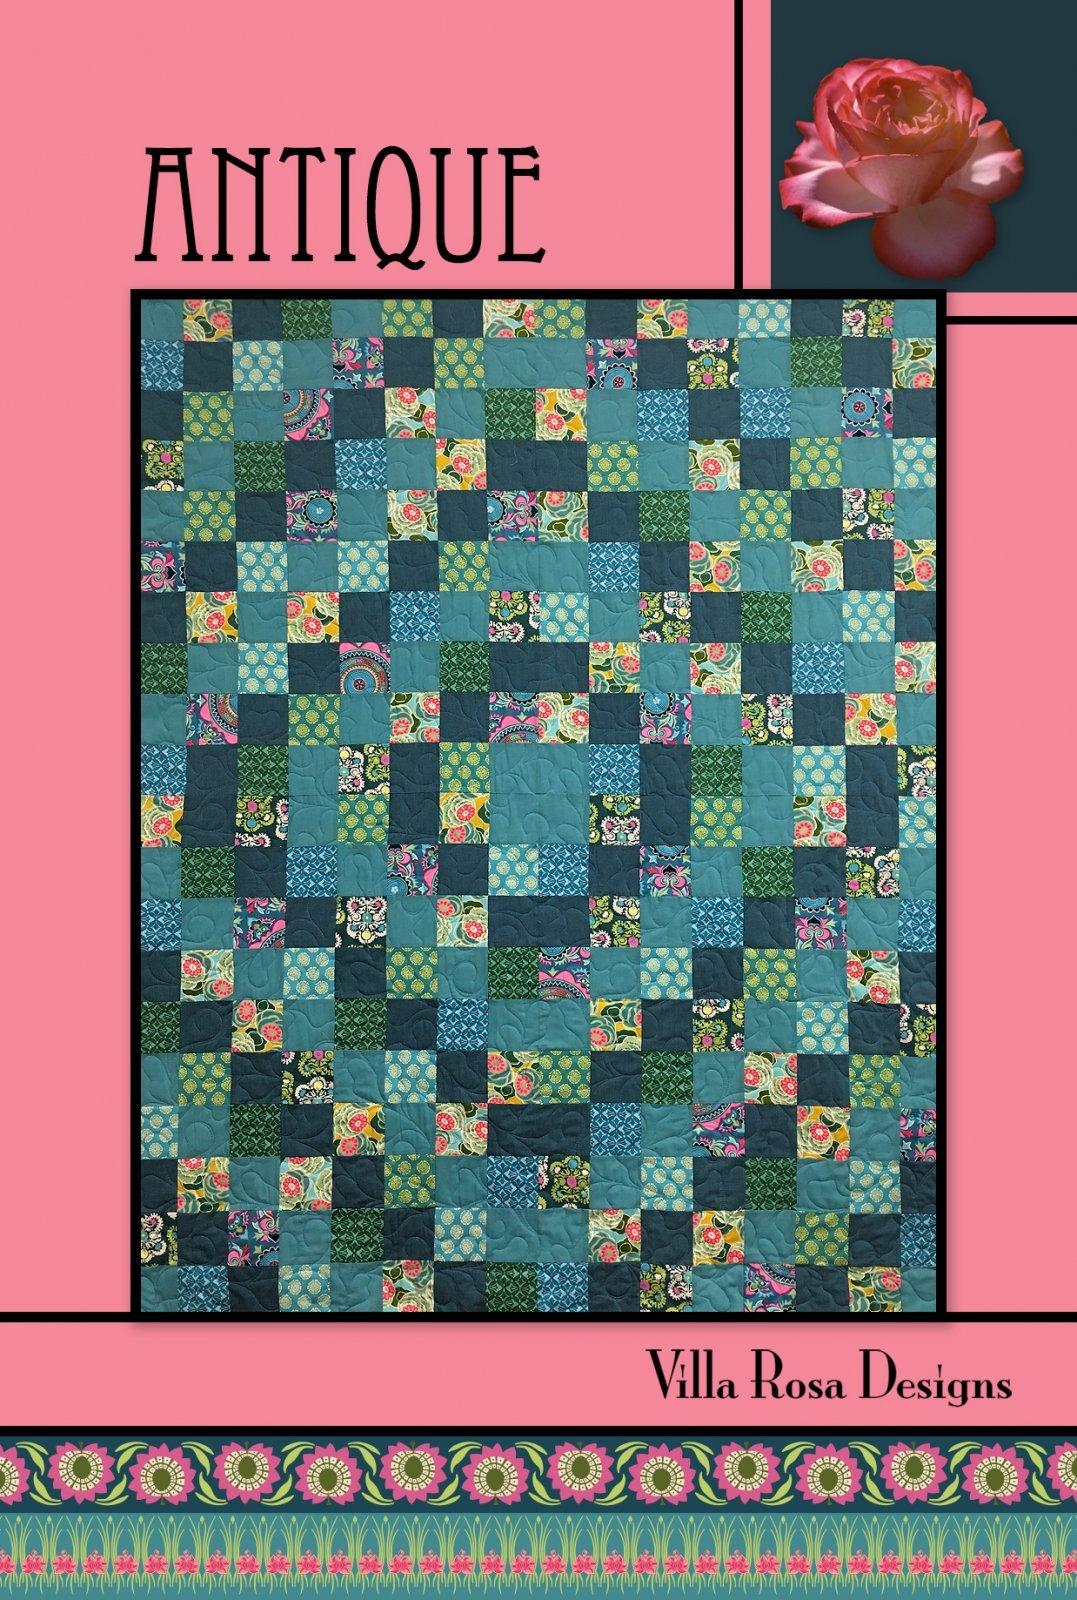 Antique RoseCard Quilt Pattern by Villa Rosa Designs